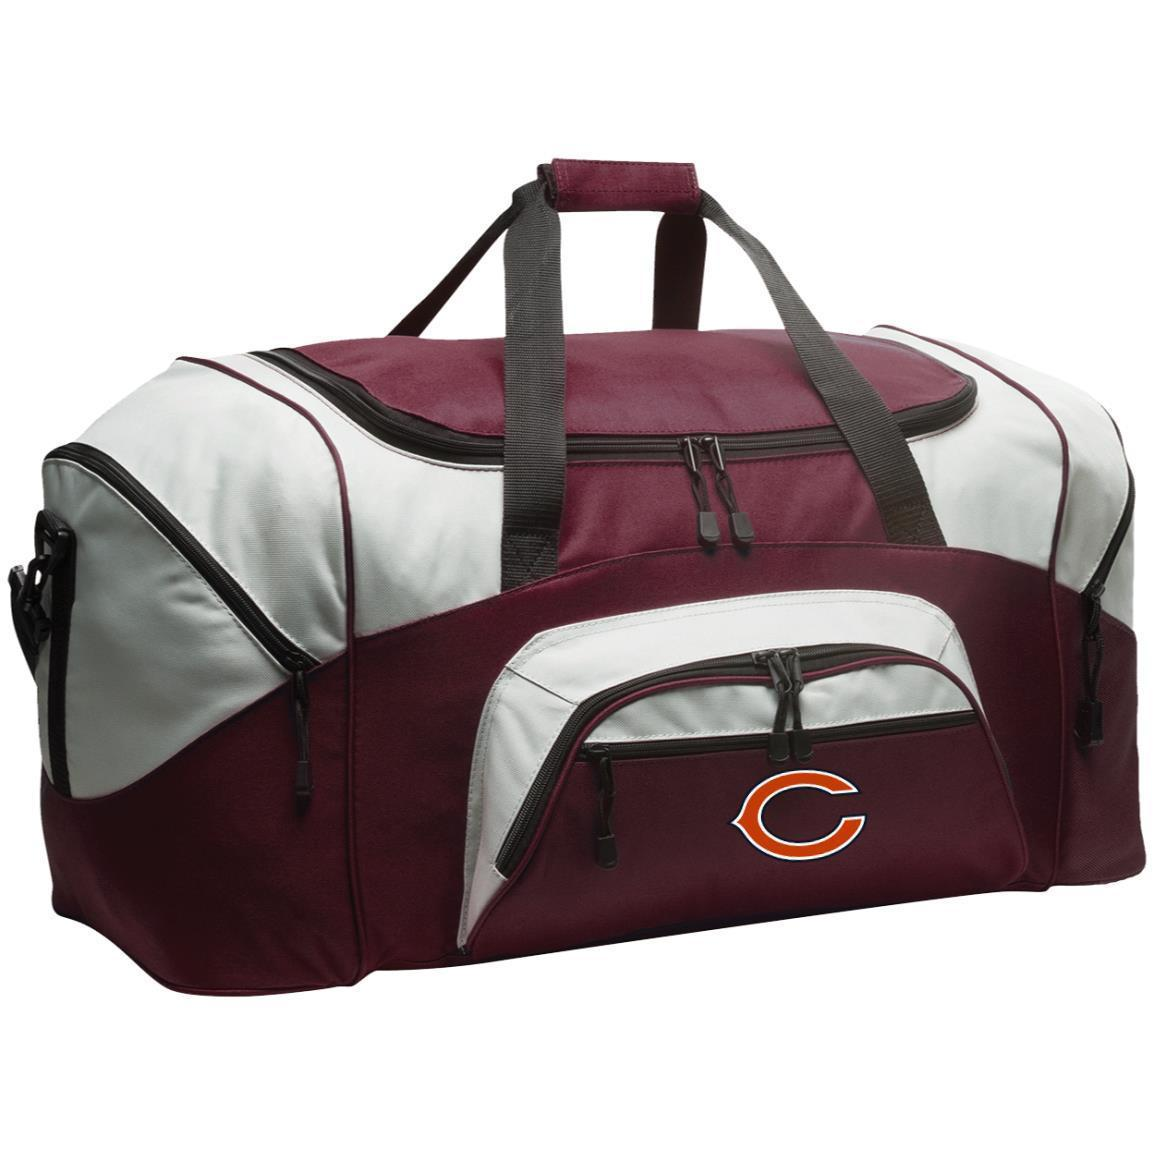 Chicago Bears Nfl Colorblock Sport Duffel Bag